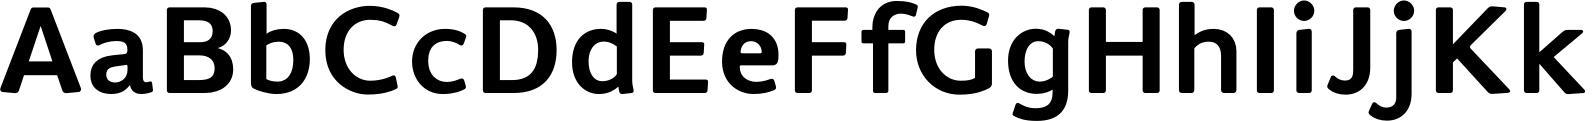 FlemboTitle